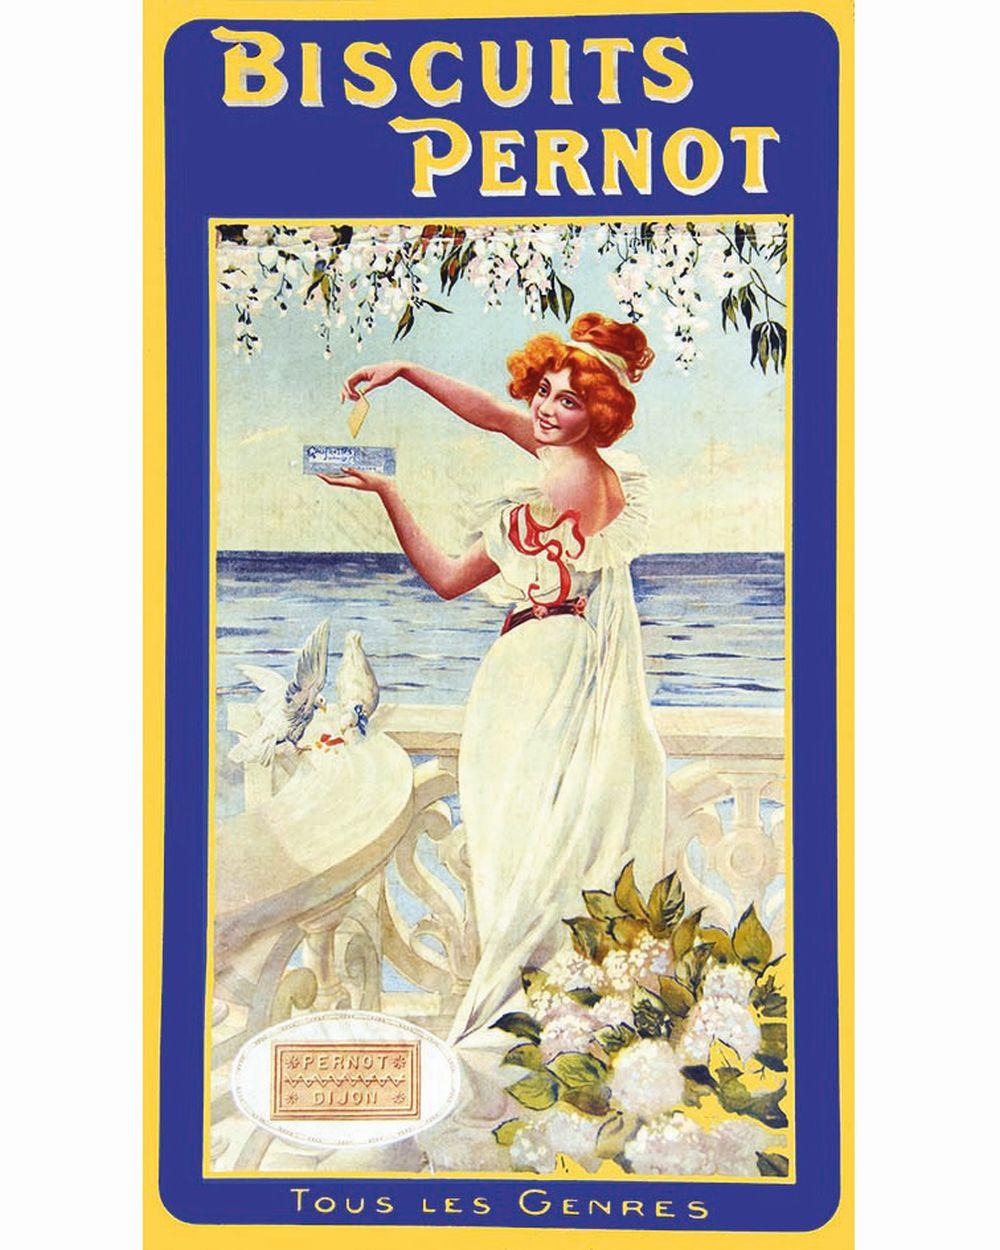 Biscuits Pernot Dijon tous les genres     vers 1900  Dijon (Côte-d'Or)